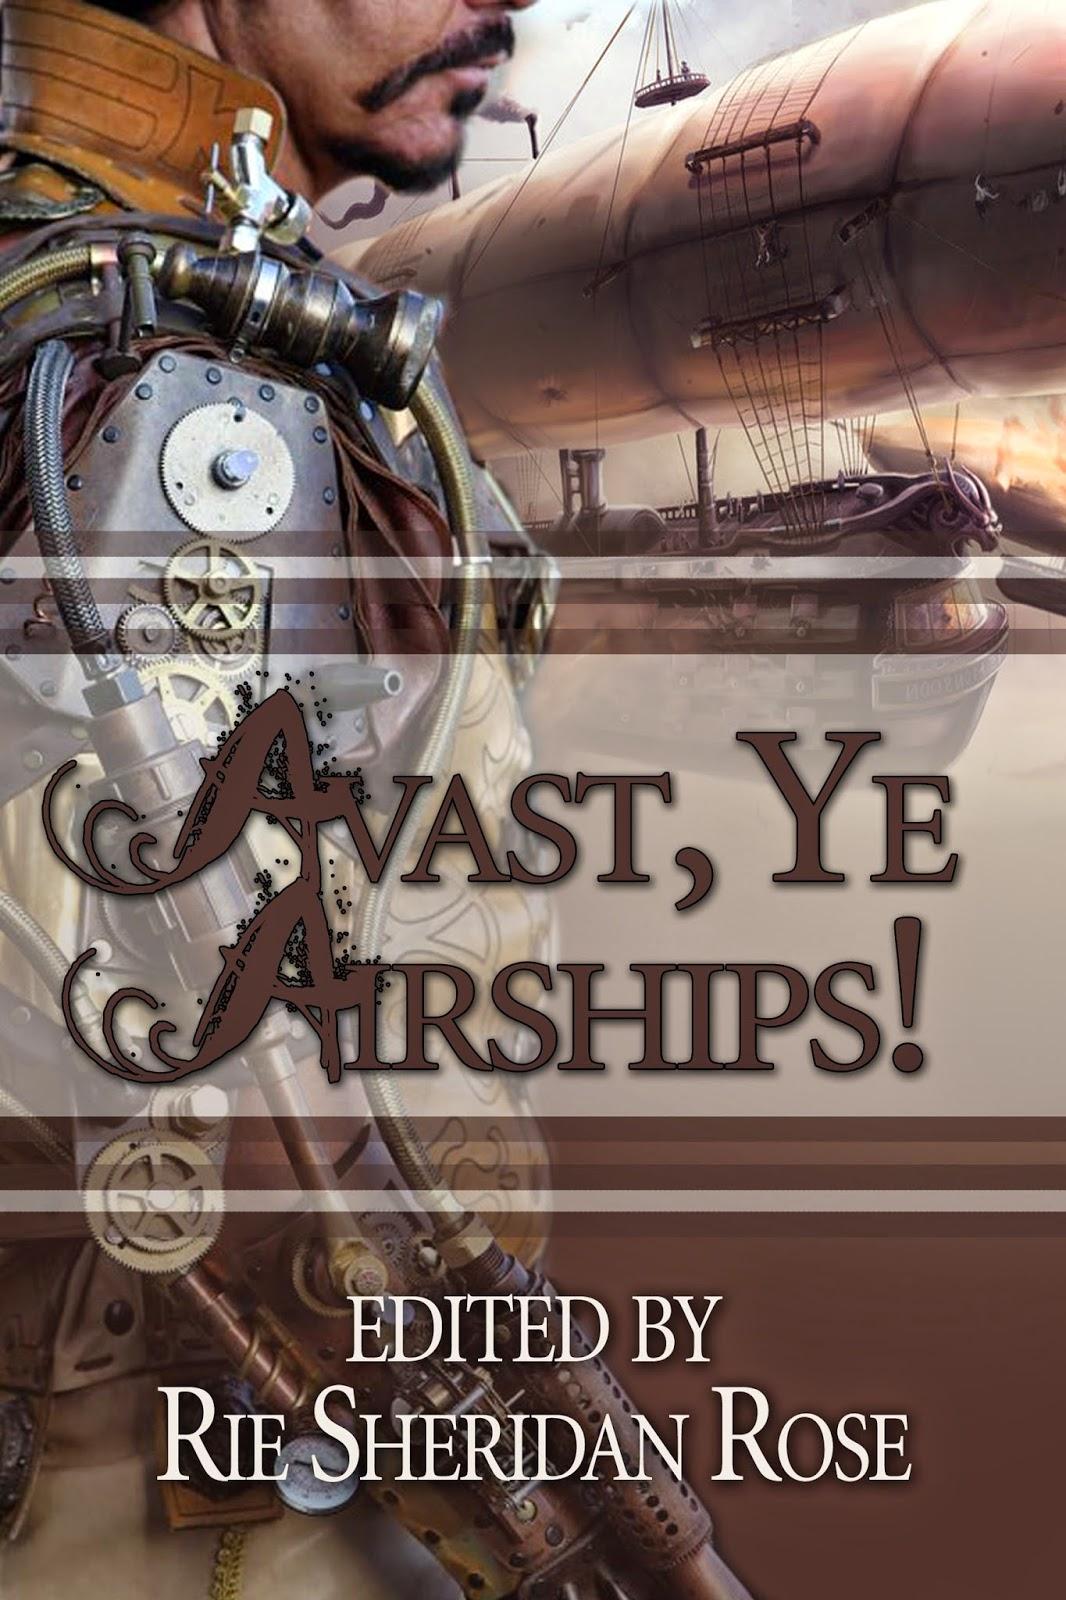 http://mochamemoirspress.com/avast-ye-airships/